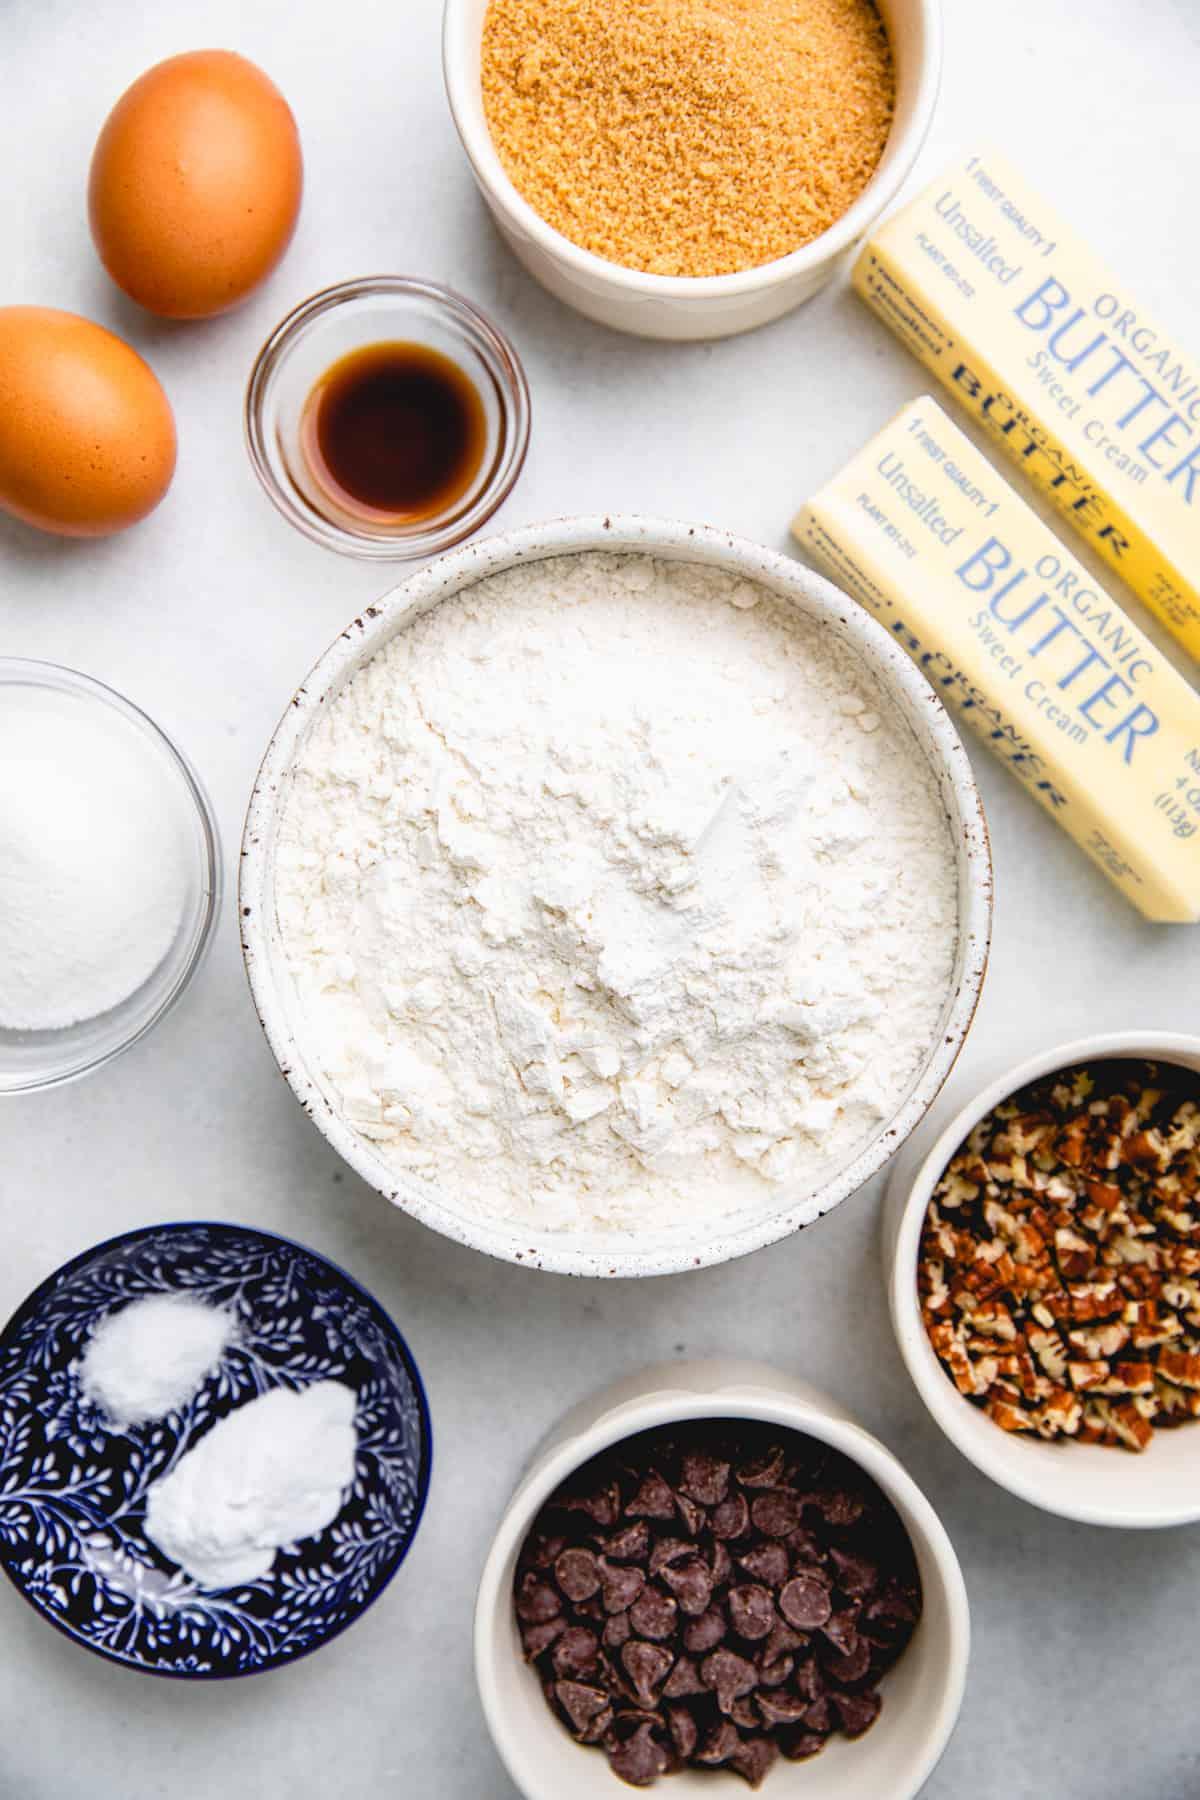 Ingredients for Pecan Chocolate Chip Cookies.